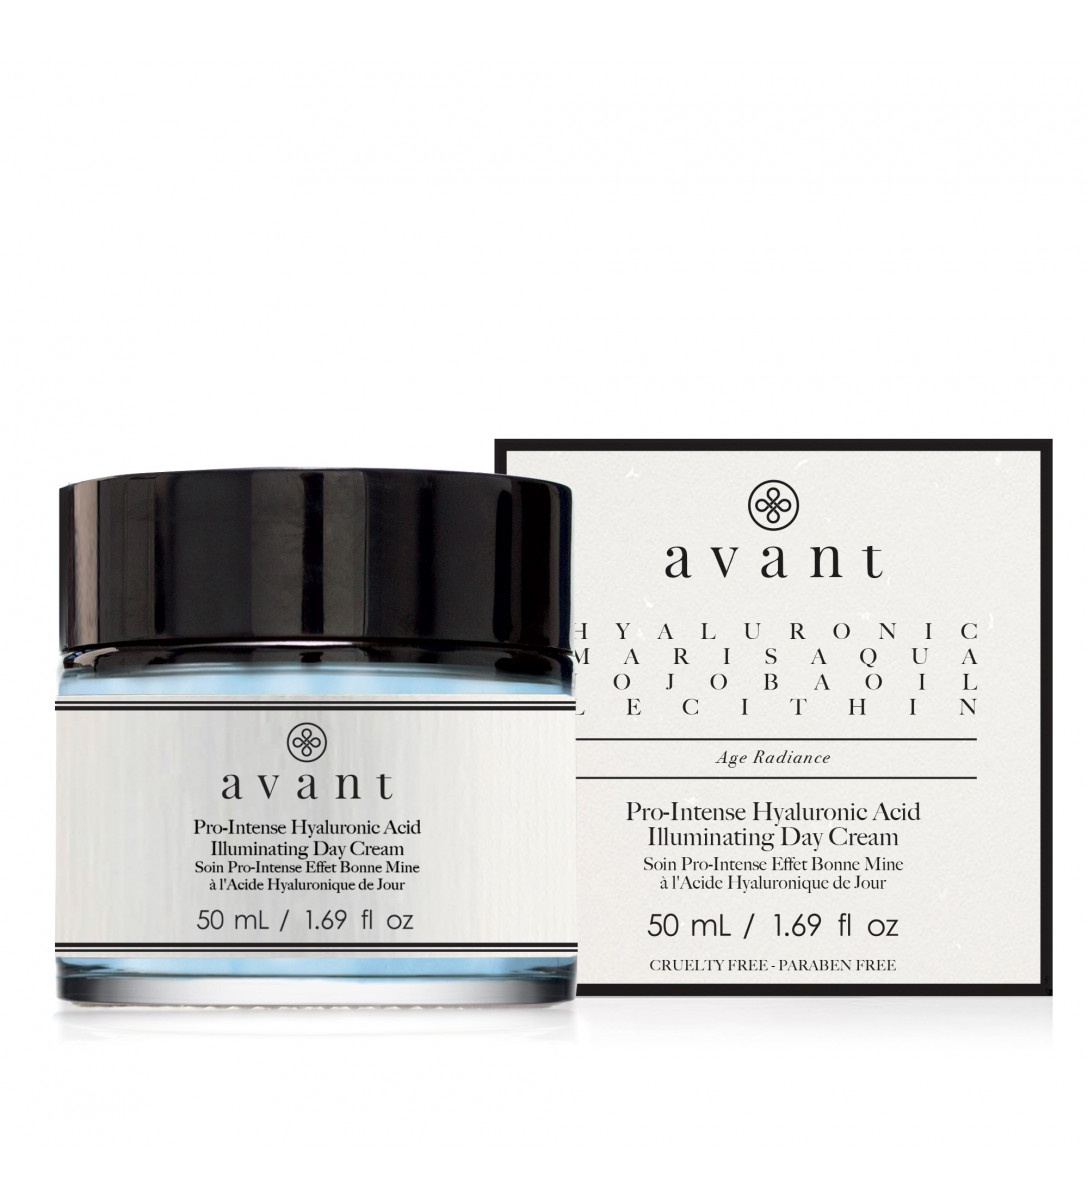 Avant Pro-Intense Hyaluronic Acid Illuminating Day Cream